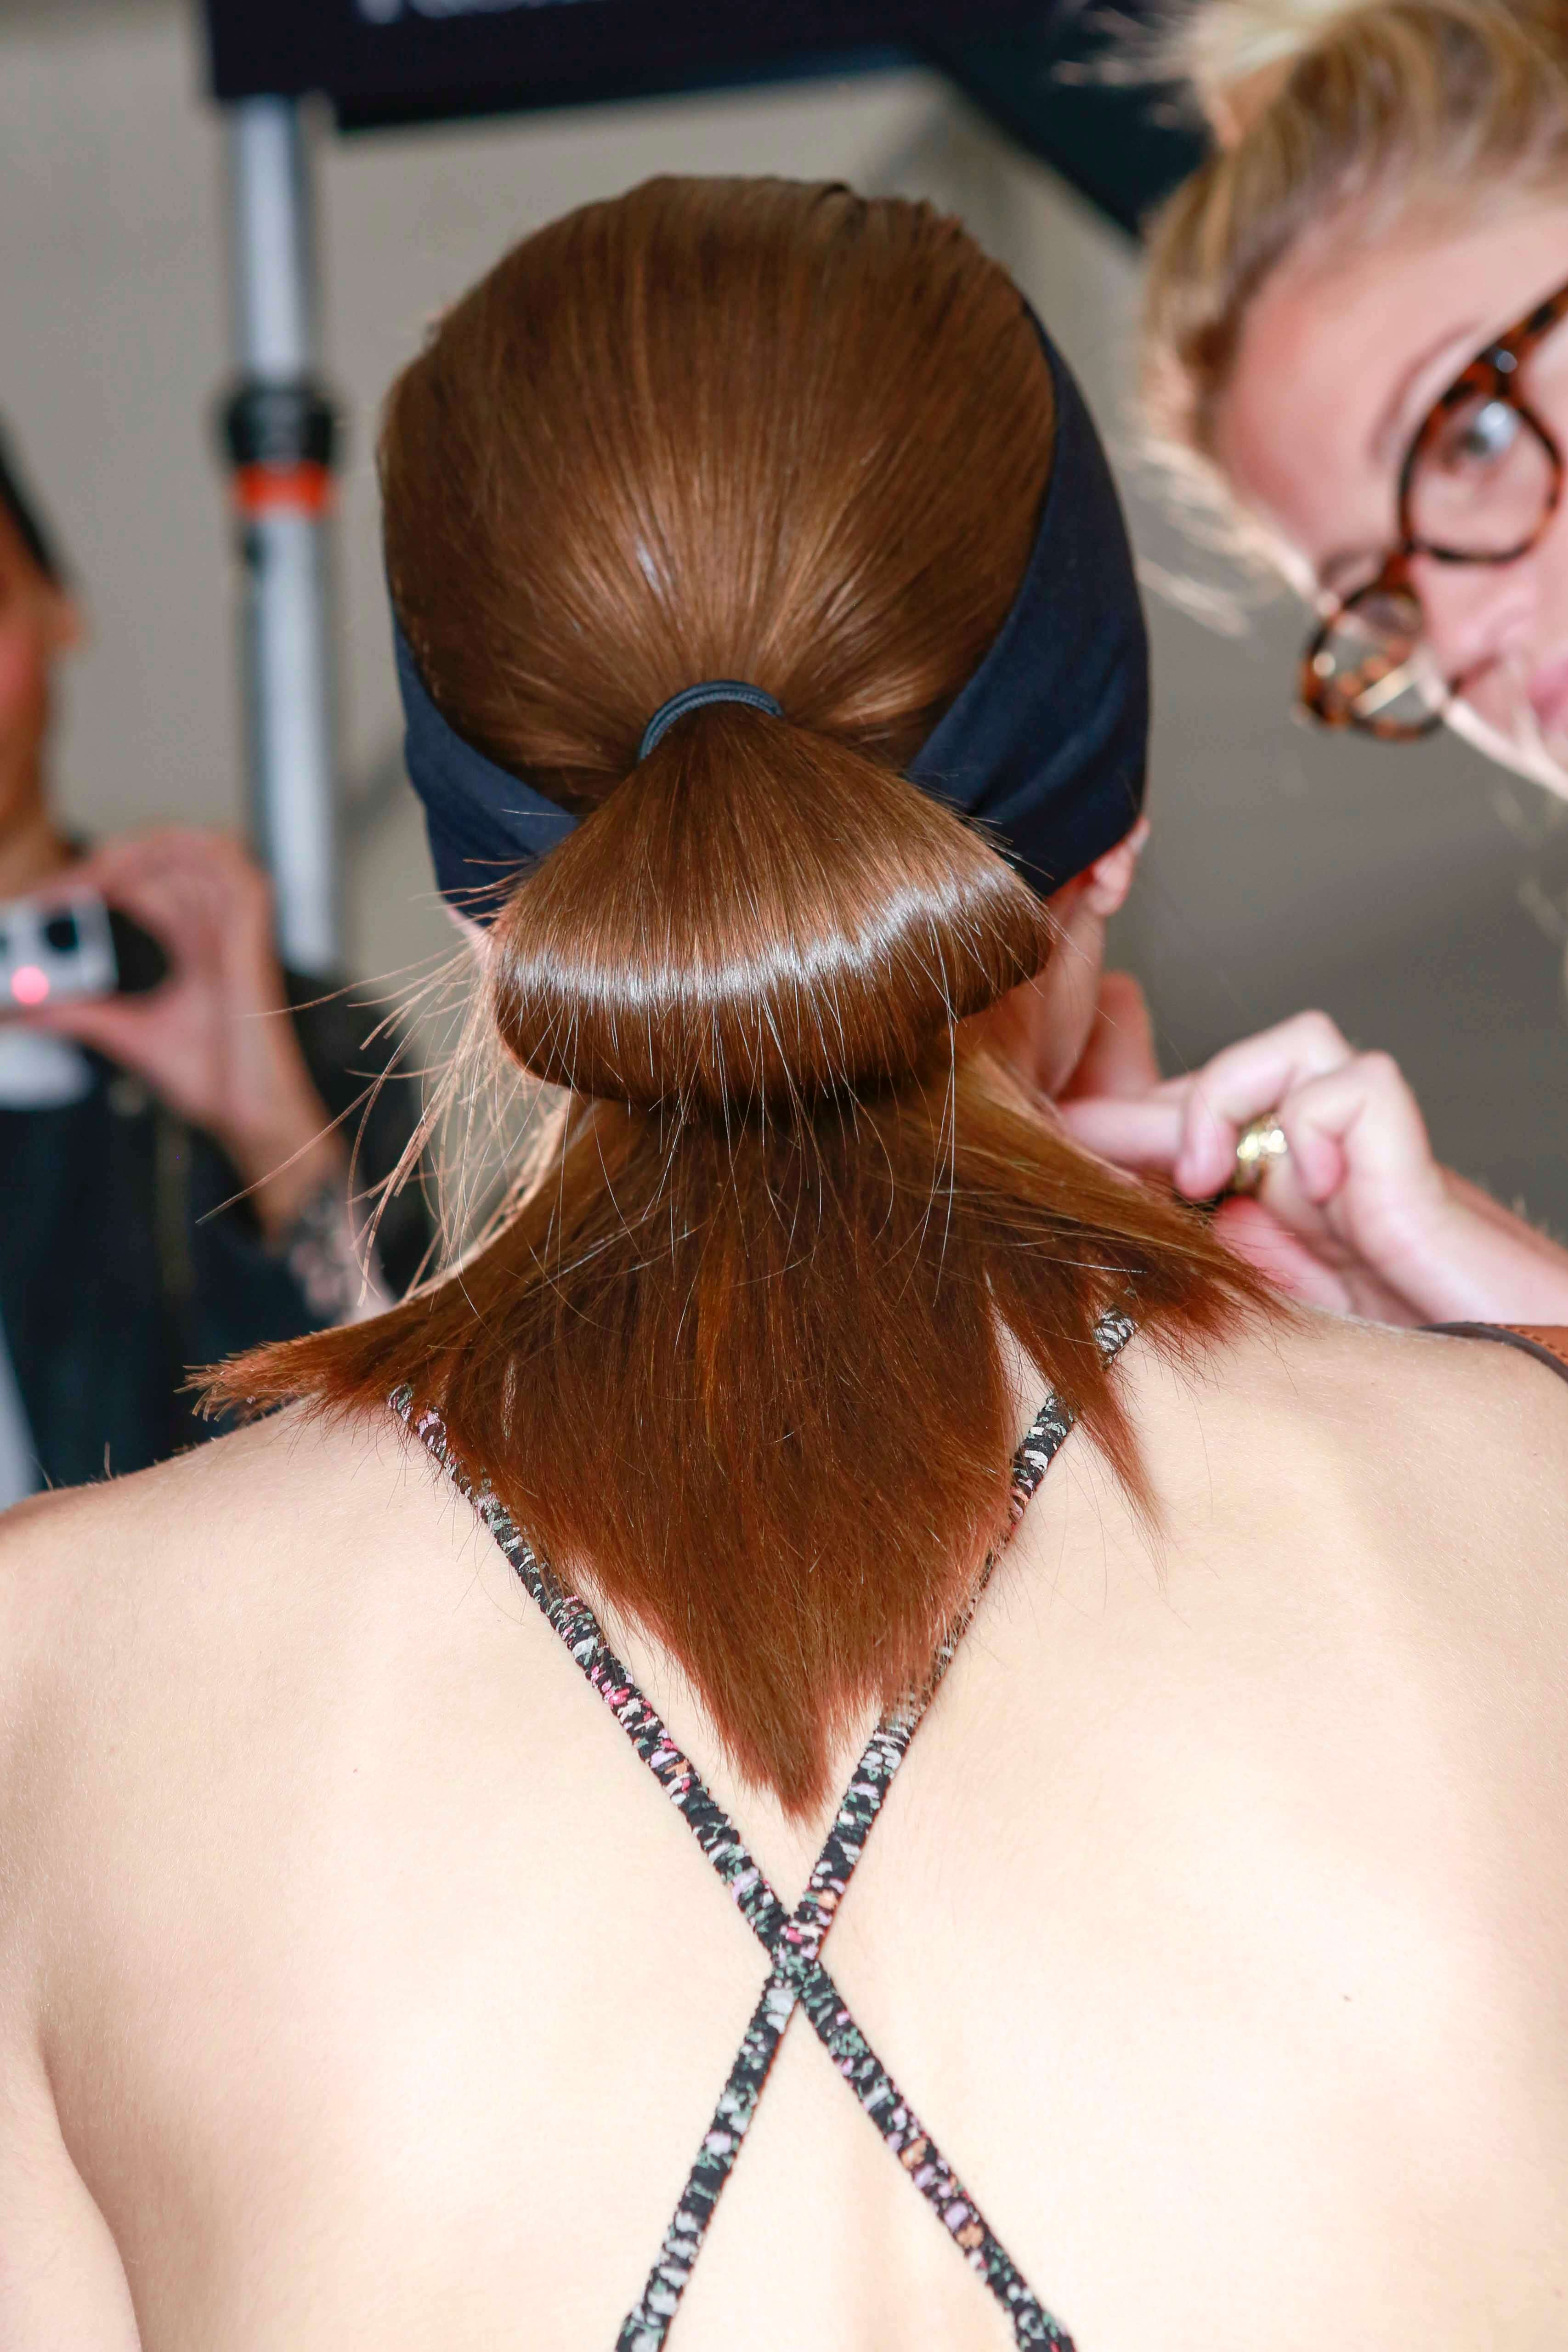 Keep hair straight overnight: avoid hairbands and ties